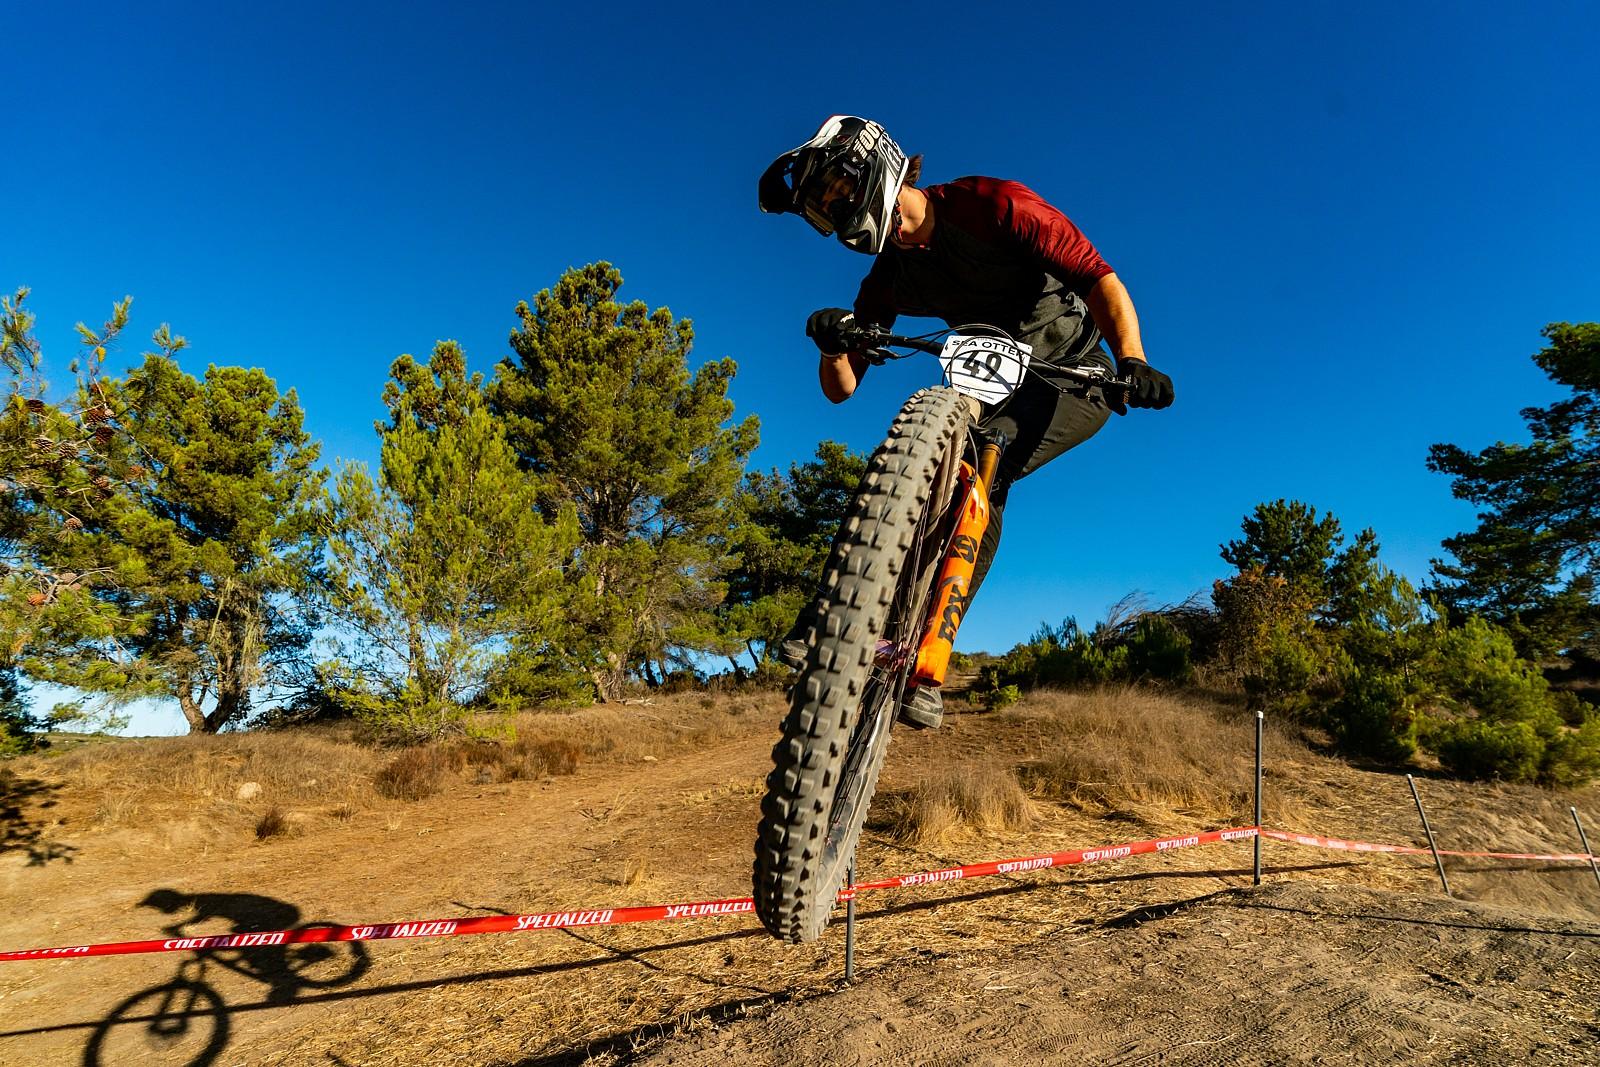 Pablo Mabarak - Zuestman - Mountain Biking Pictures - Vital MTB